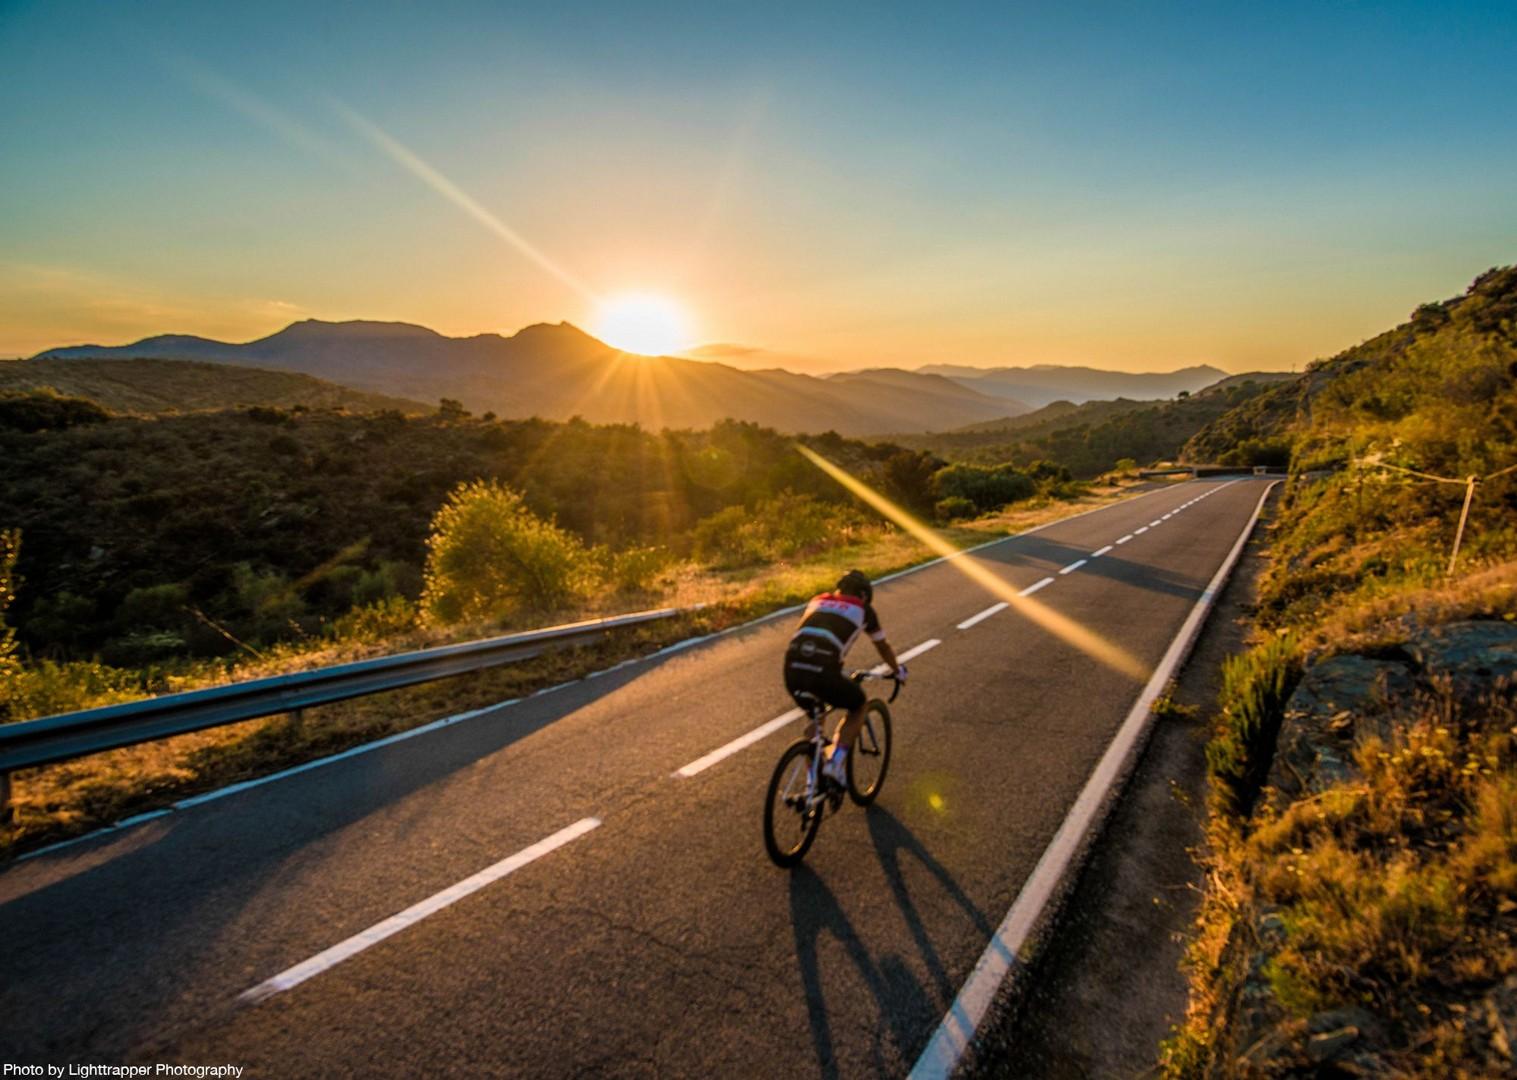 road-cycling-sunset-saddle-skedaddle-spain-coast-to-coast.jpg - NEW! Spain - Spanish Pyrenees Coast to Coast - Road Cycling